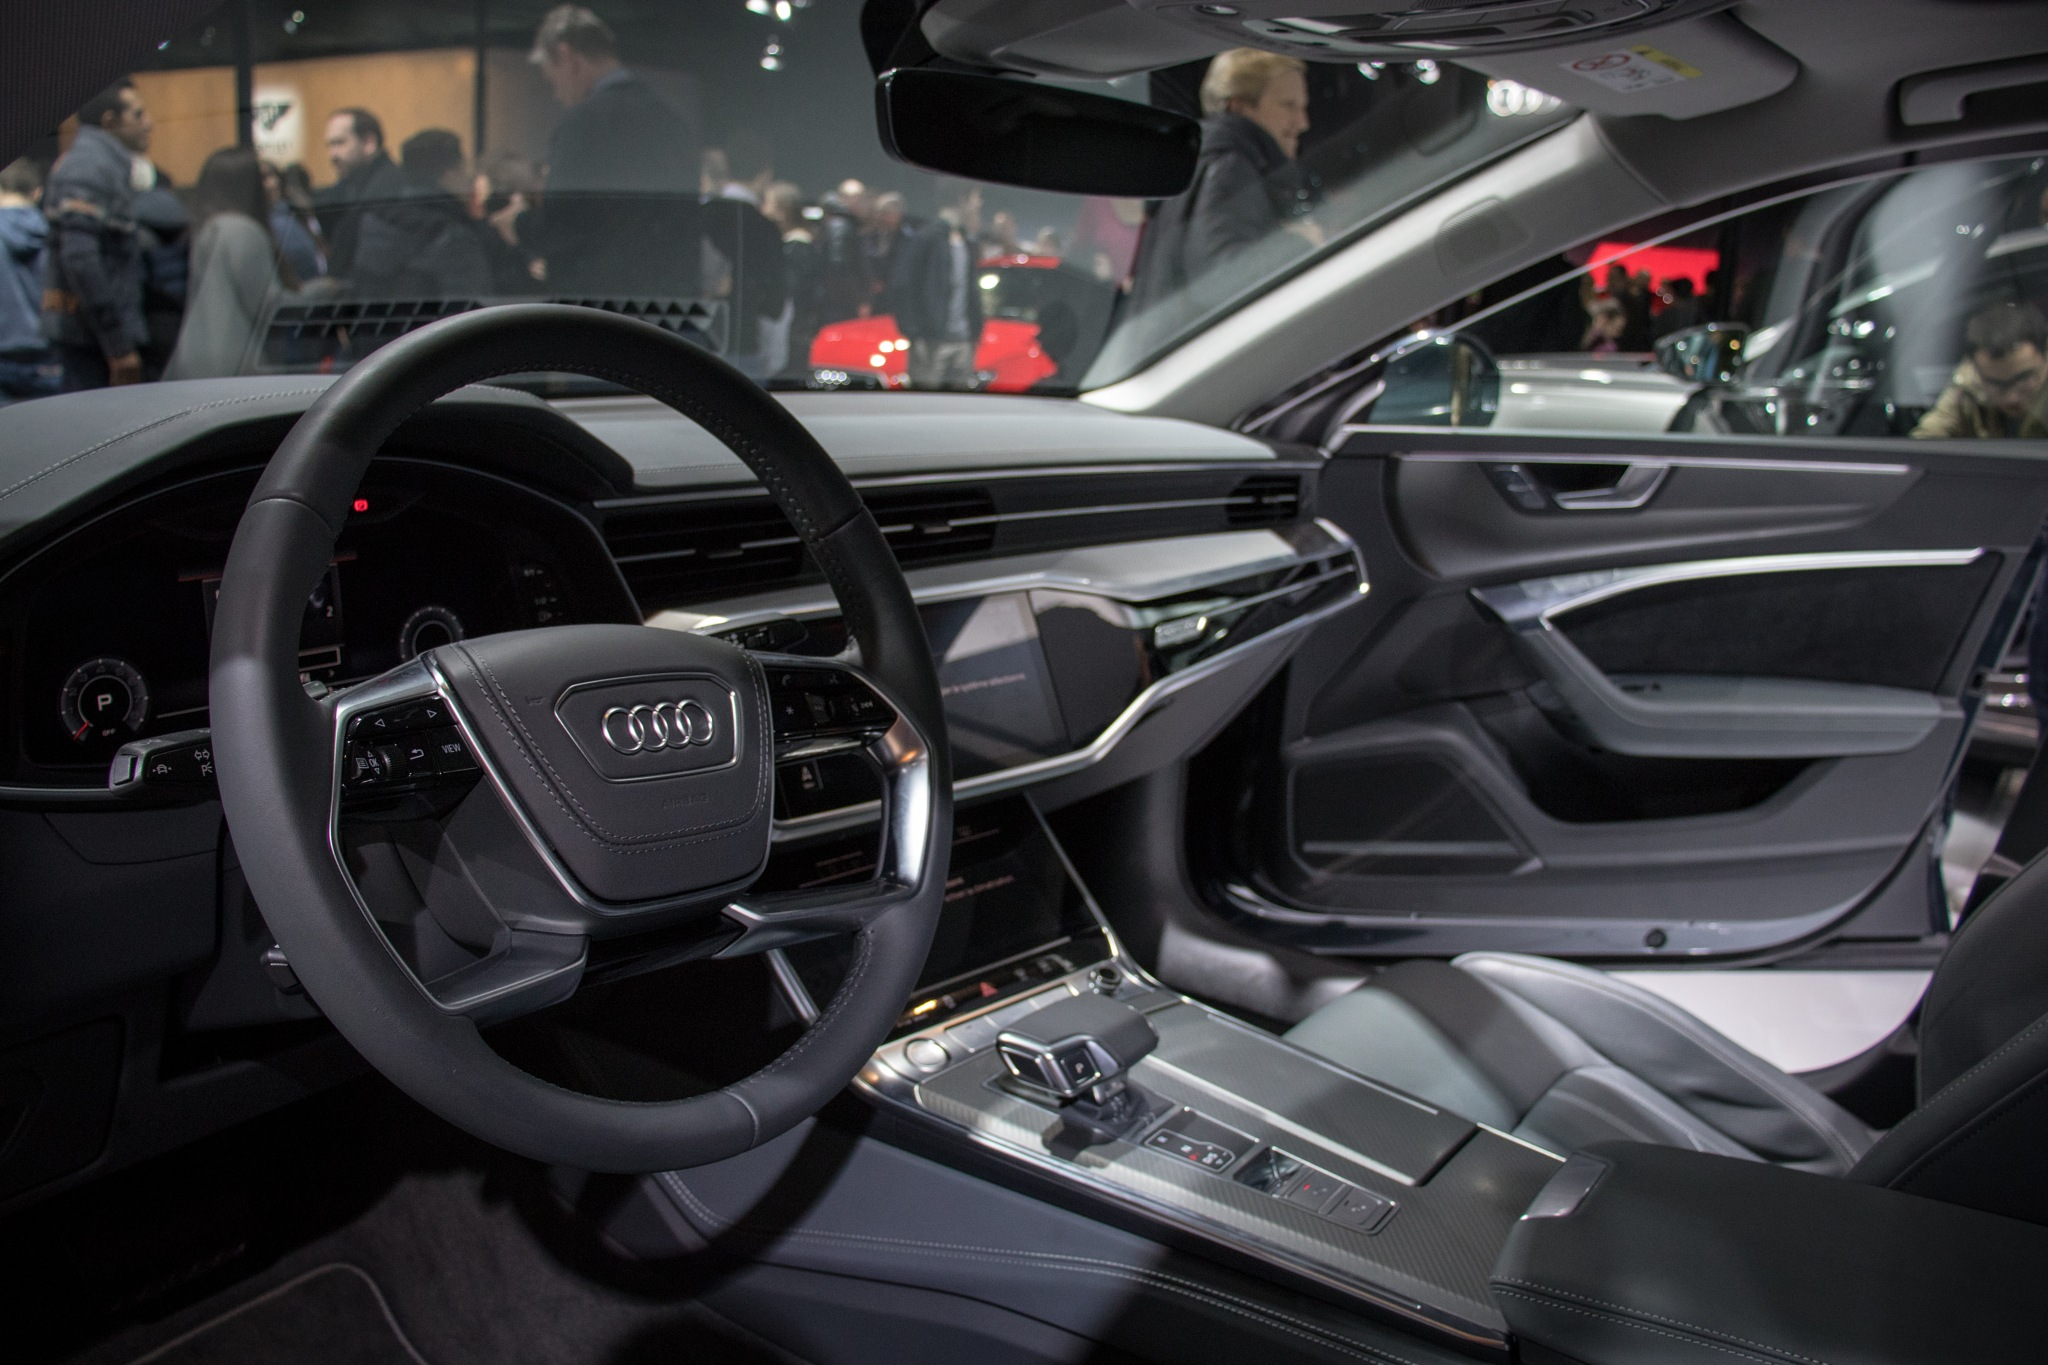 Audi A7 Interior by P.Richàrd